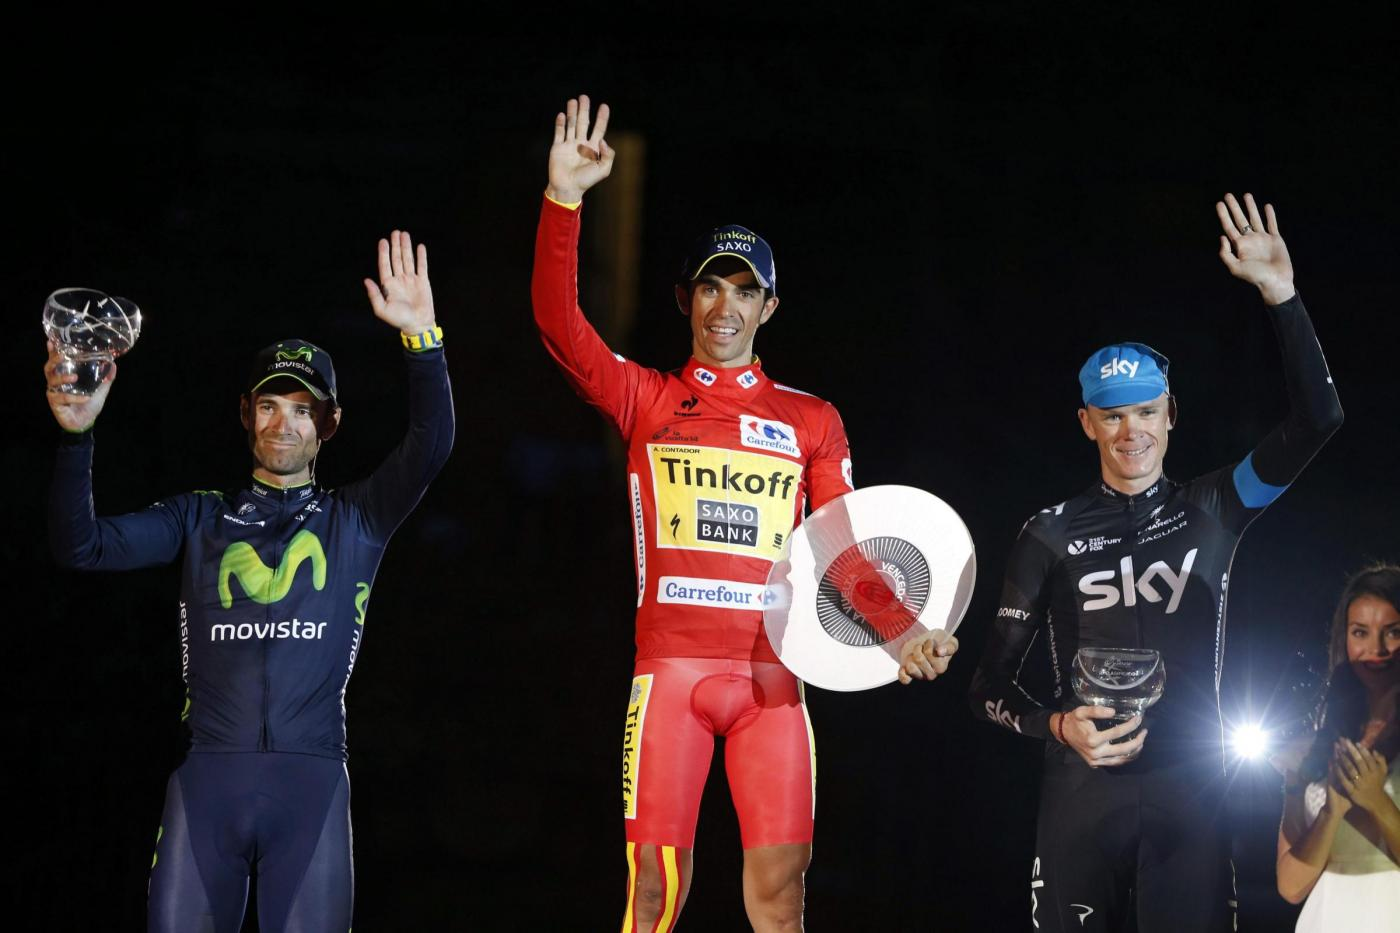 Vuelta di Spagna 2014 a Alberto Contador, il tris